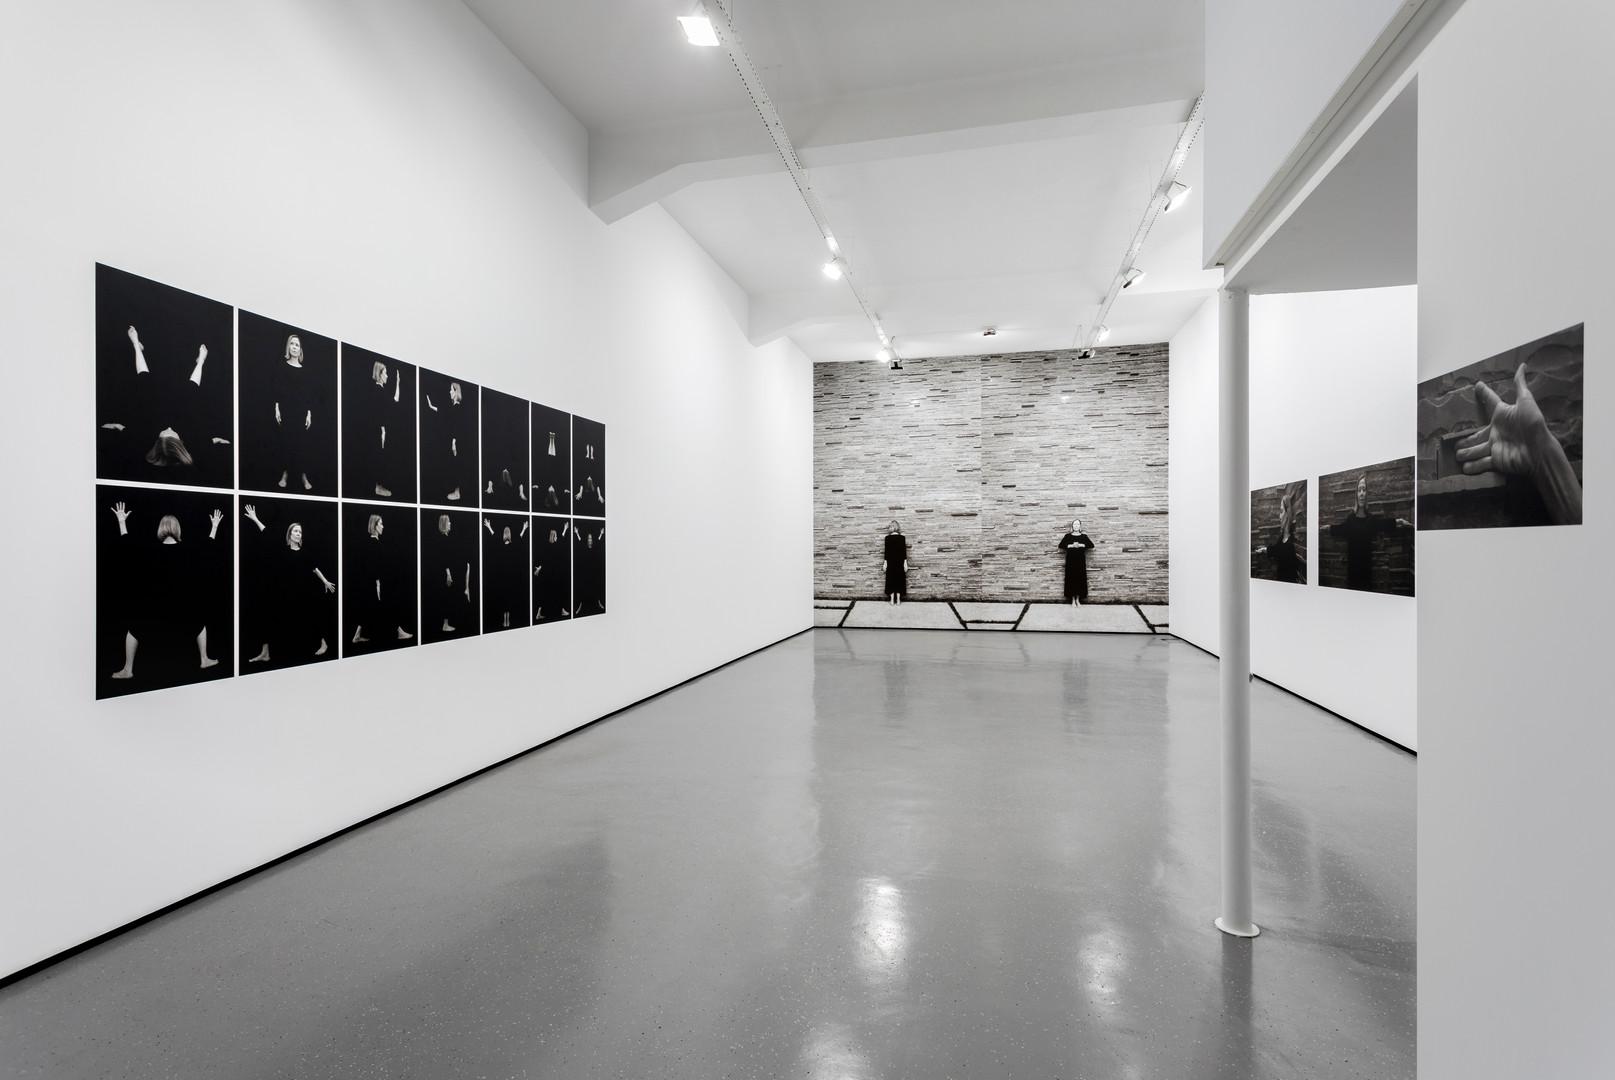 Adriana Barreto Exhibition